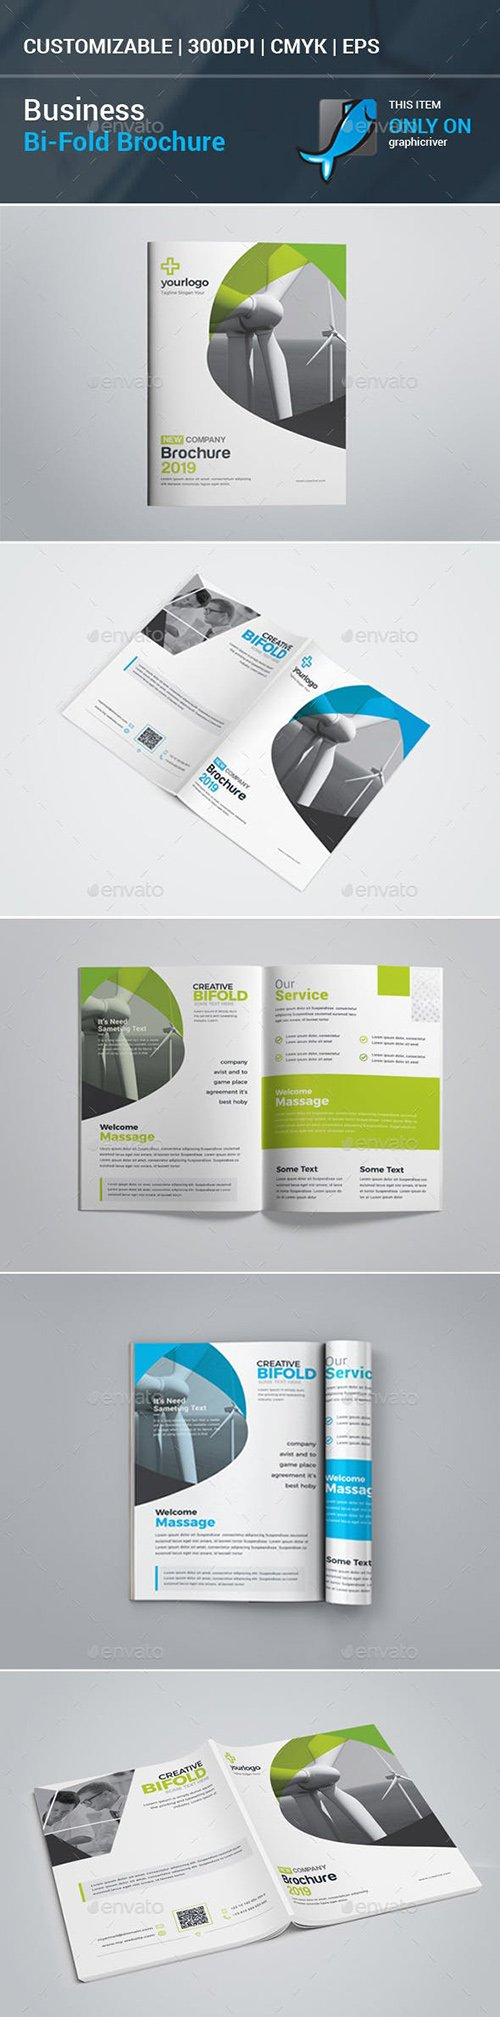 GraphicRiver - Business Bifold Brochure 23172745